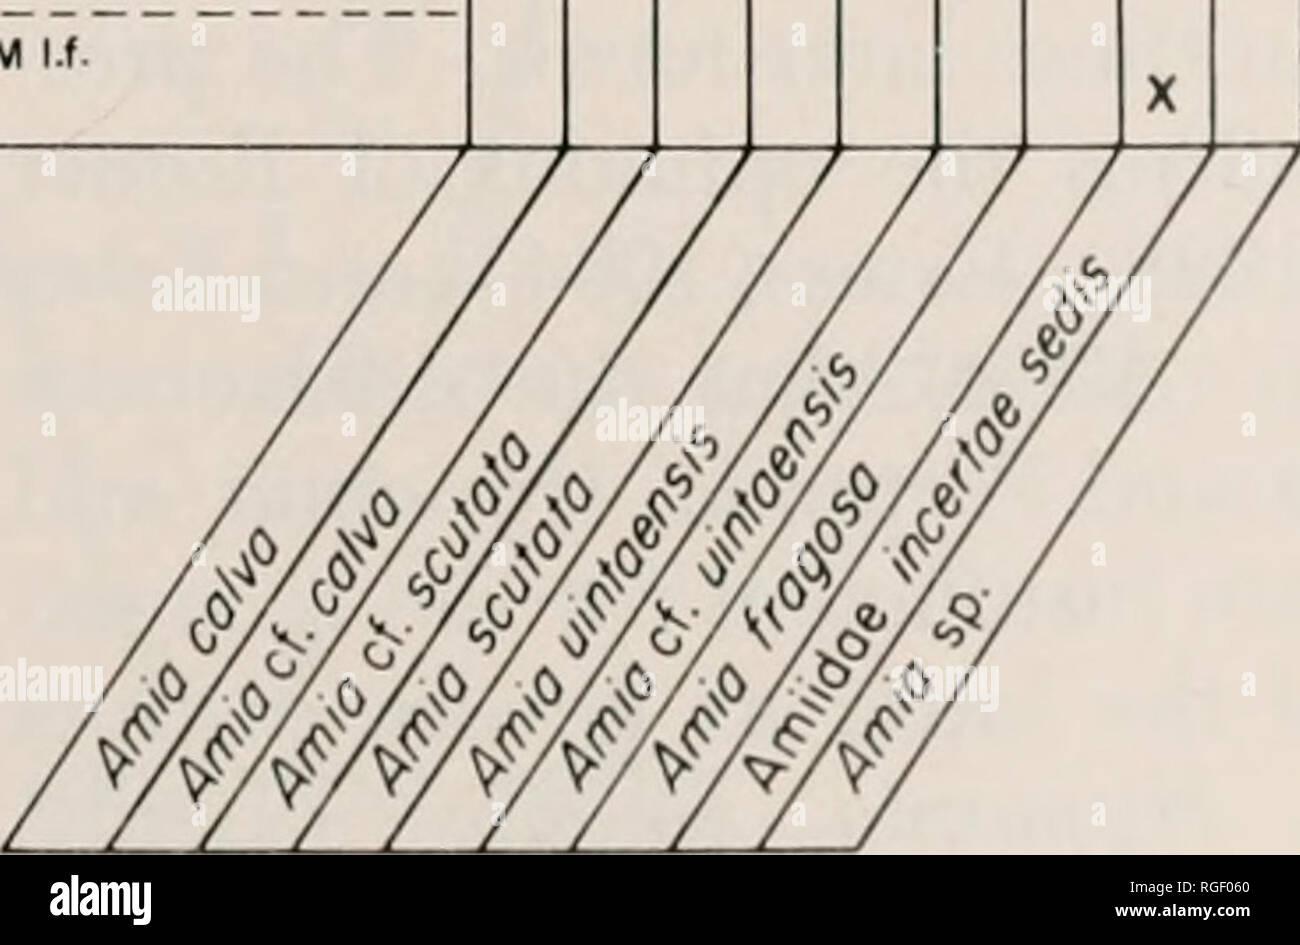 . Bulletin of the Museum of Comparative Zoology at Harvard College. Zoology. Fossil Amiids • Boreske 77 PLEISTOCENE PLIOCENE POST-BLANCAN BLANCAN- HEMPHILLIAN CLARENOONIAN FOSSIL LAKE BEOS (lOAHO FM.) WAKEENEY It. (OGALLALA FM.) LOWER VALENTINE FM. BARSTOVIAN MIOCENE HEMINGFORDIAN ARIKAREEAN EUBANKS l.f. (PAWNEE CREEK FM.) TURTLE BUTTE FM. WHITNEYAN OLIGOCENE ORELLAN CHAORONIAN RUBY PAPER SHALE (PASSAMARl FM.) GRANT HORSE PRAIRIE SHALE FLORISSANT FM. ORELLA MEMBER (BRULE FM.) CHADRON FM. CYPRESS HILLS FM. OUCHESNEAN EOCENE UINTAN BRIDGERIAN WASATCHIAN CLARNO FM. HORSEFLY RIVER BEDS UINTA FM. W - Stock Image